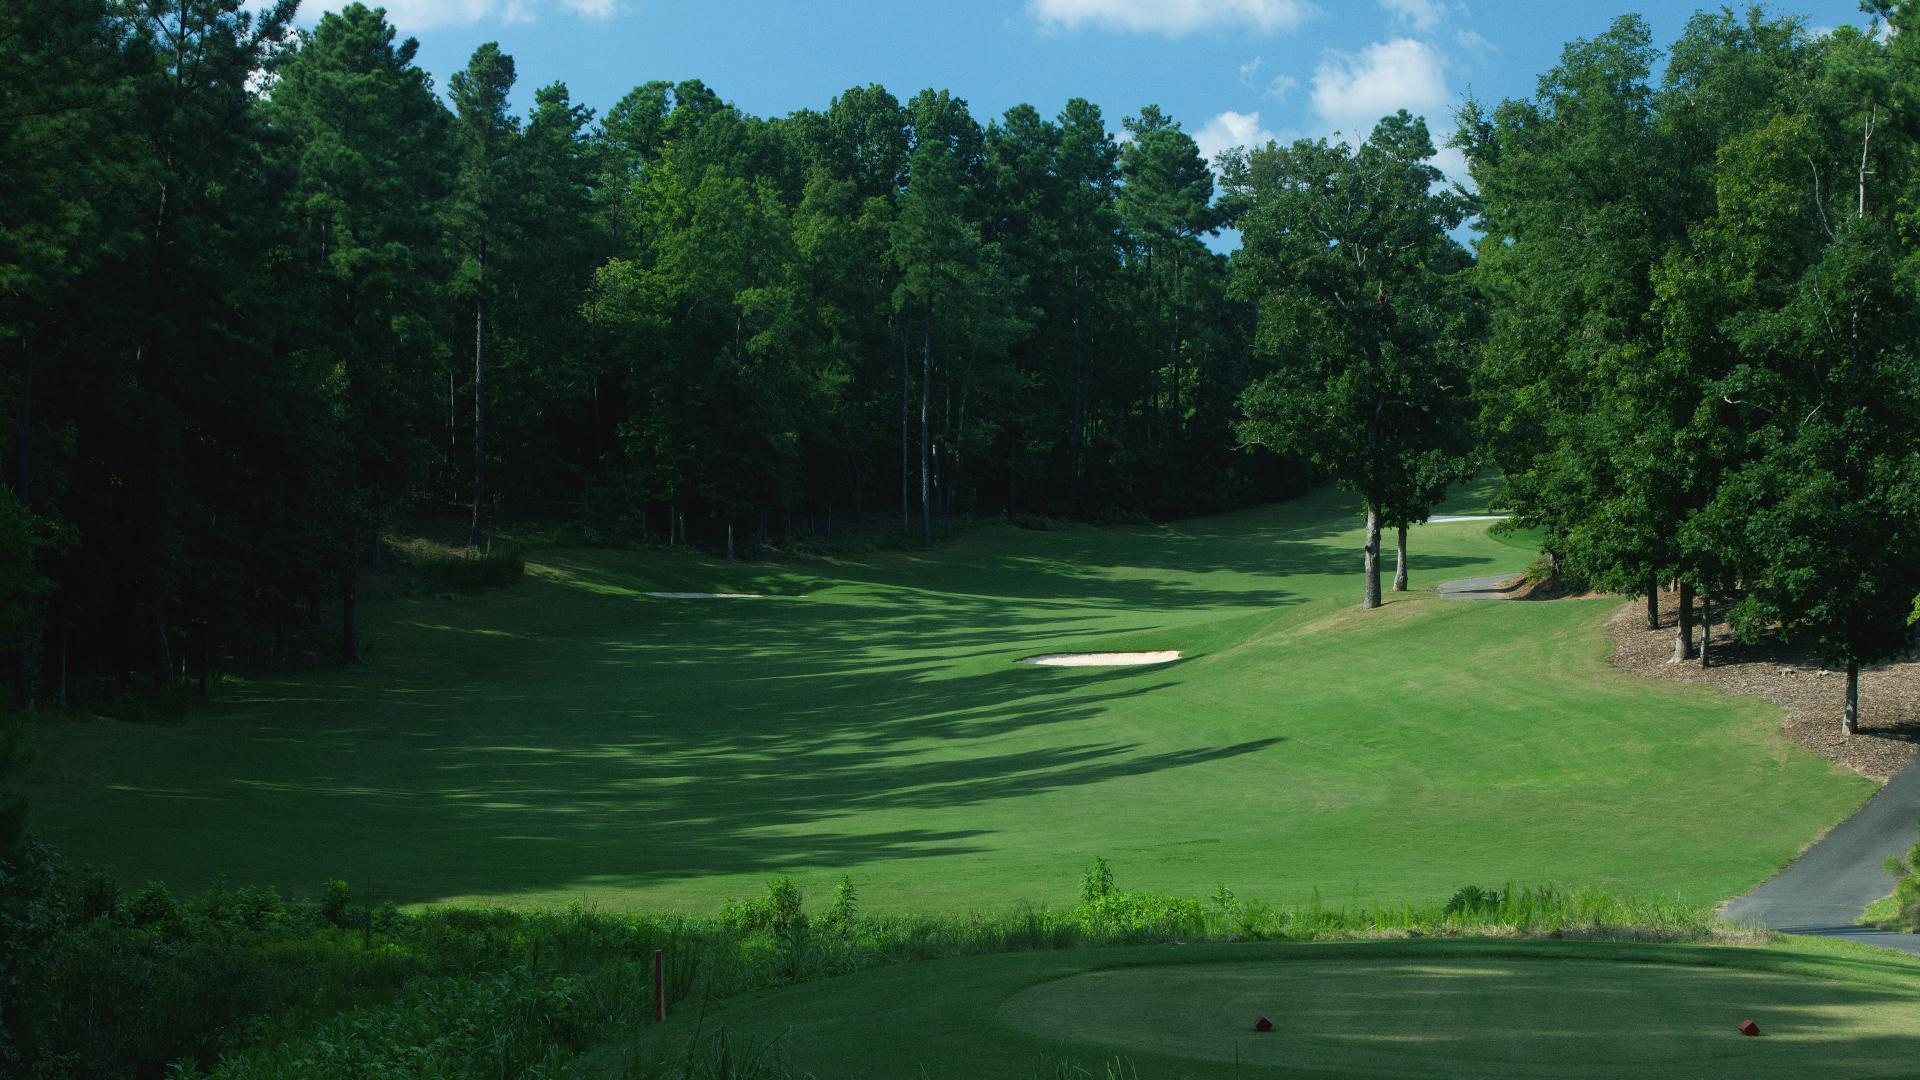 Future 18 hole Nicklaus Design golf course